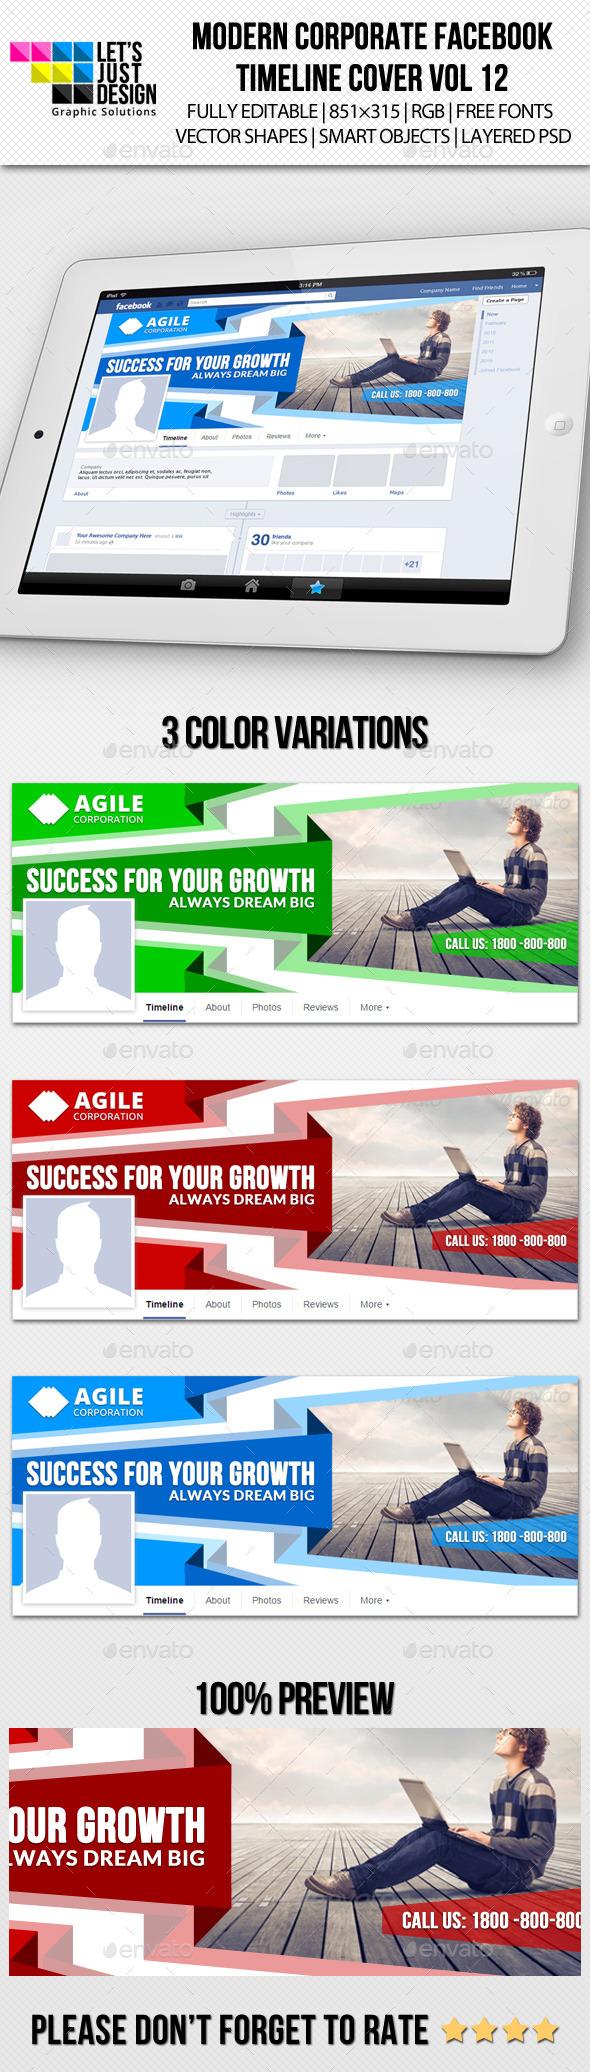 Modern Corporate Facebook Timeline Cover Vol 12 - Facebook Timeline Covers Social Media